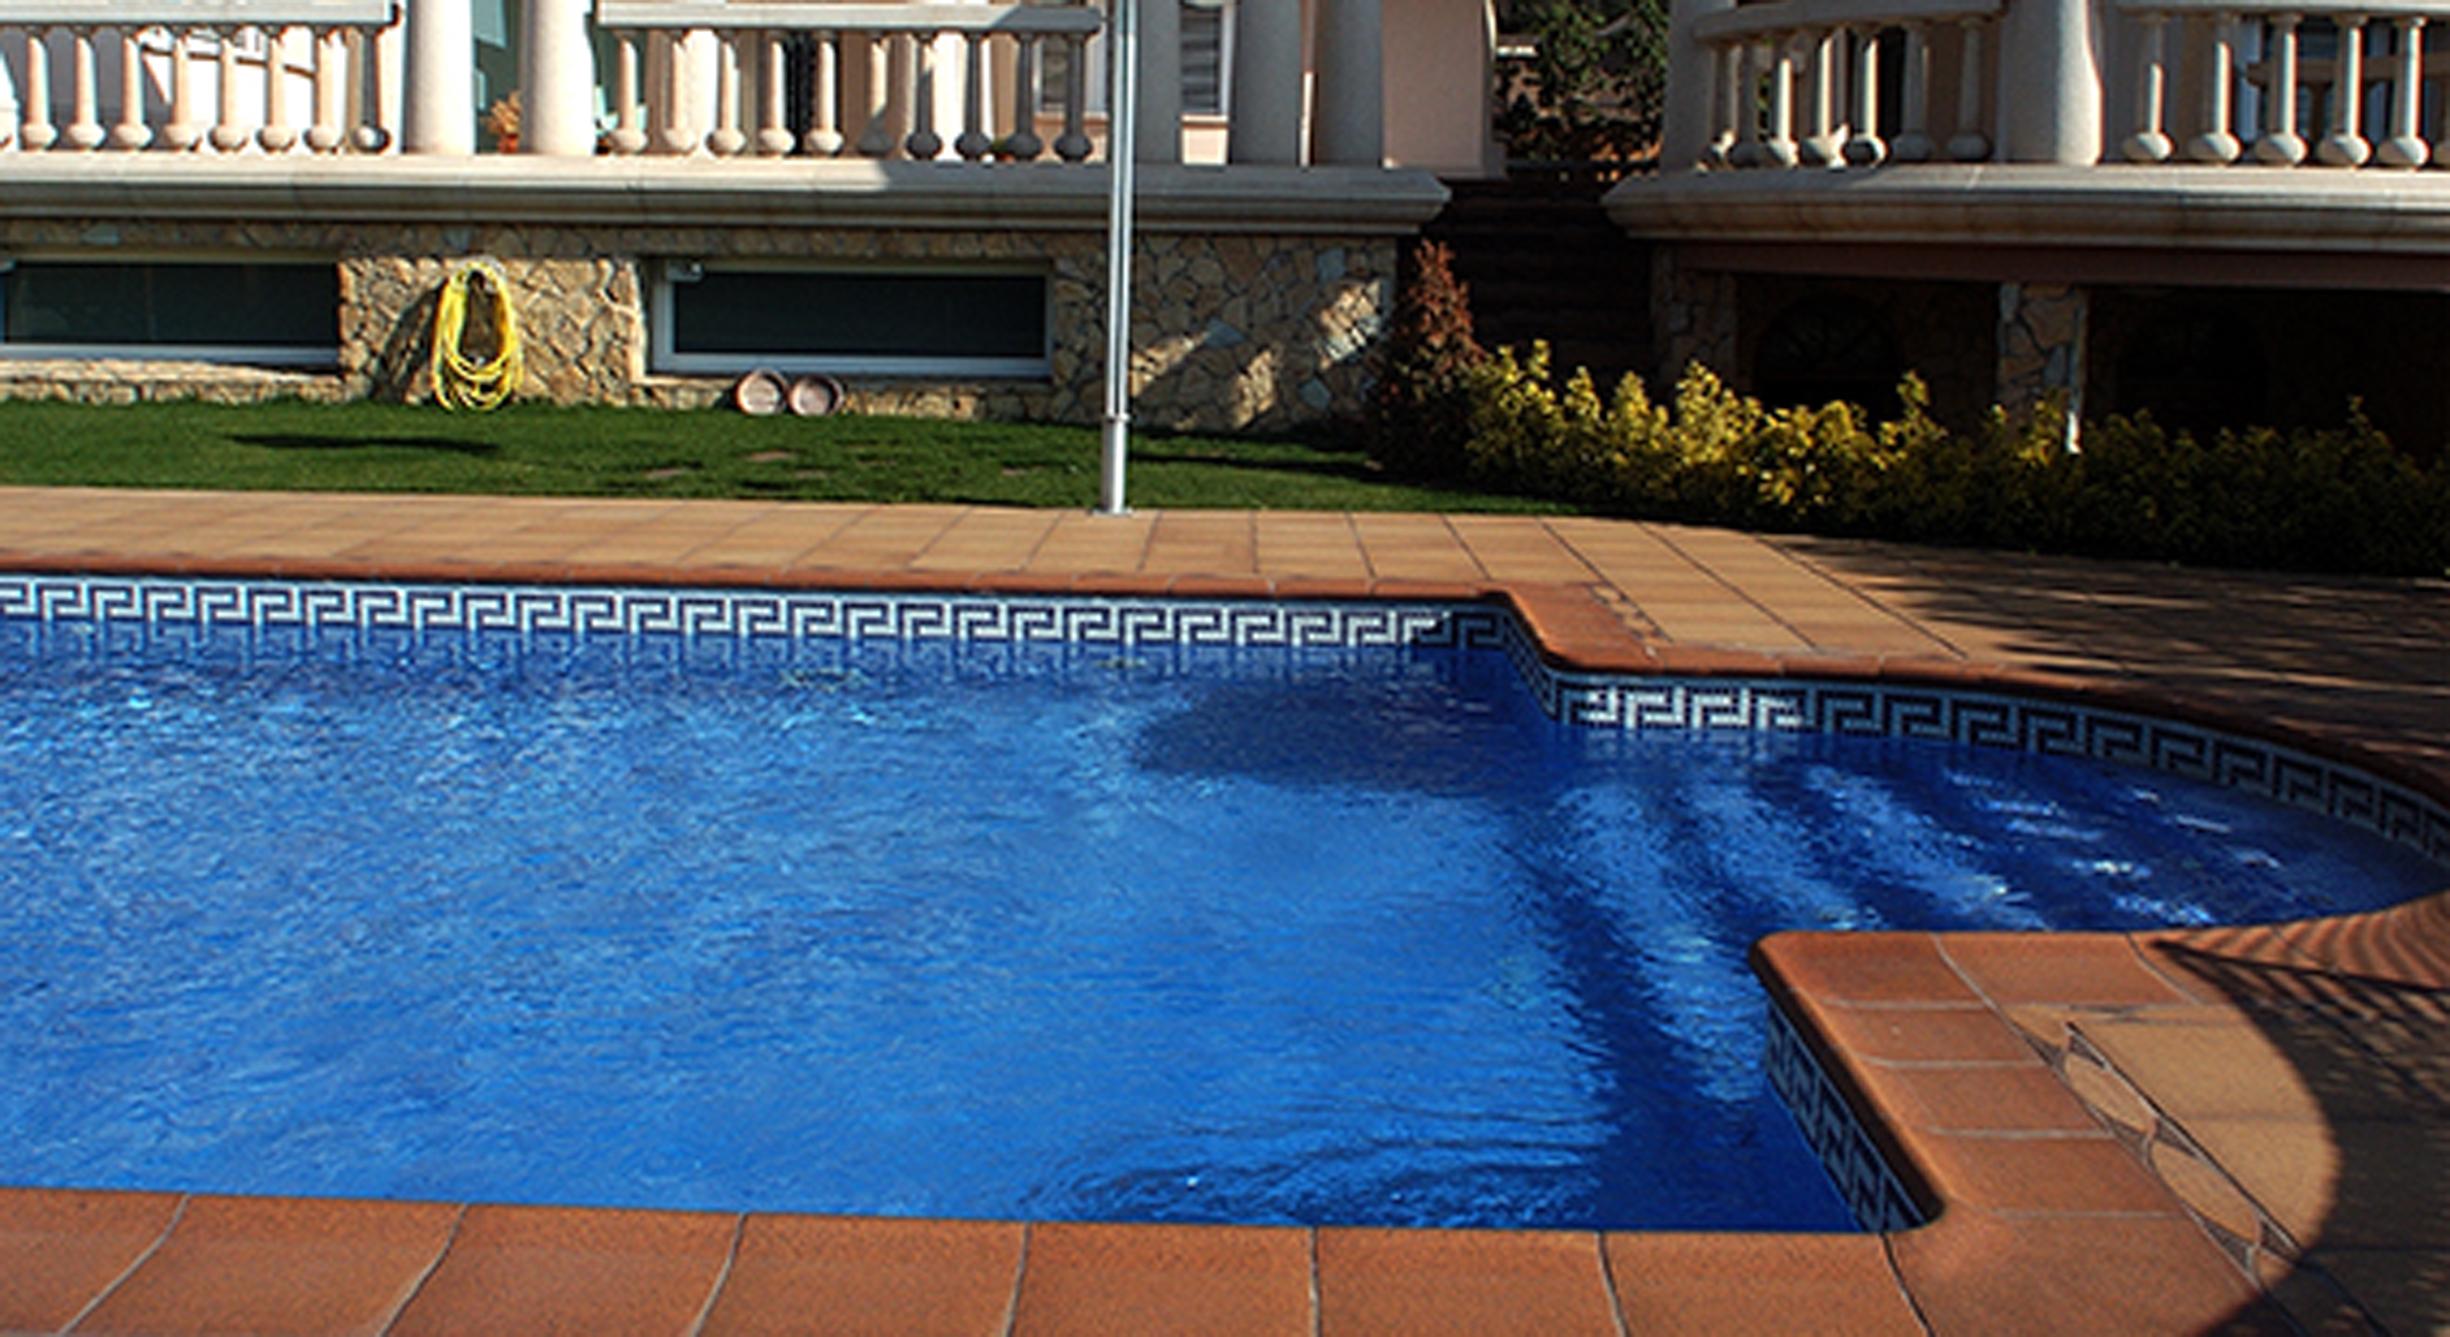 Gres de breda materialshoms for Gres de breda para piscinas